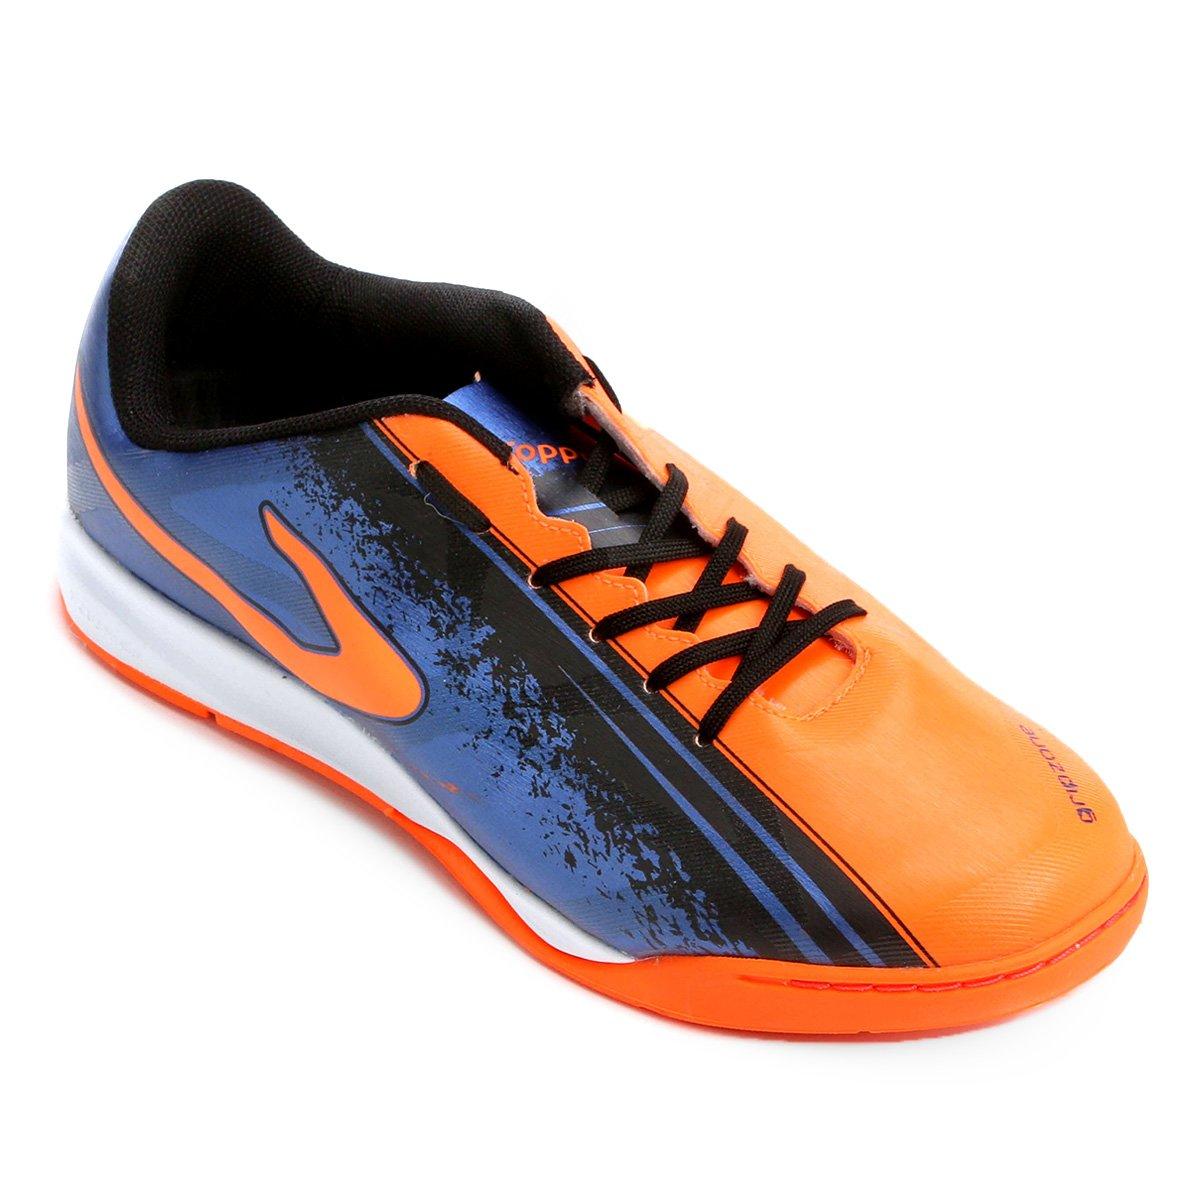 8cb5807bb Chuteira Futsal Topper Trivela - Compre Agora